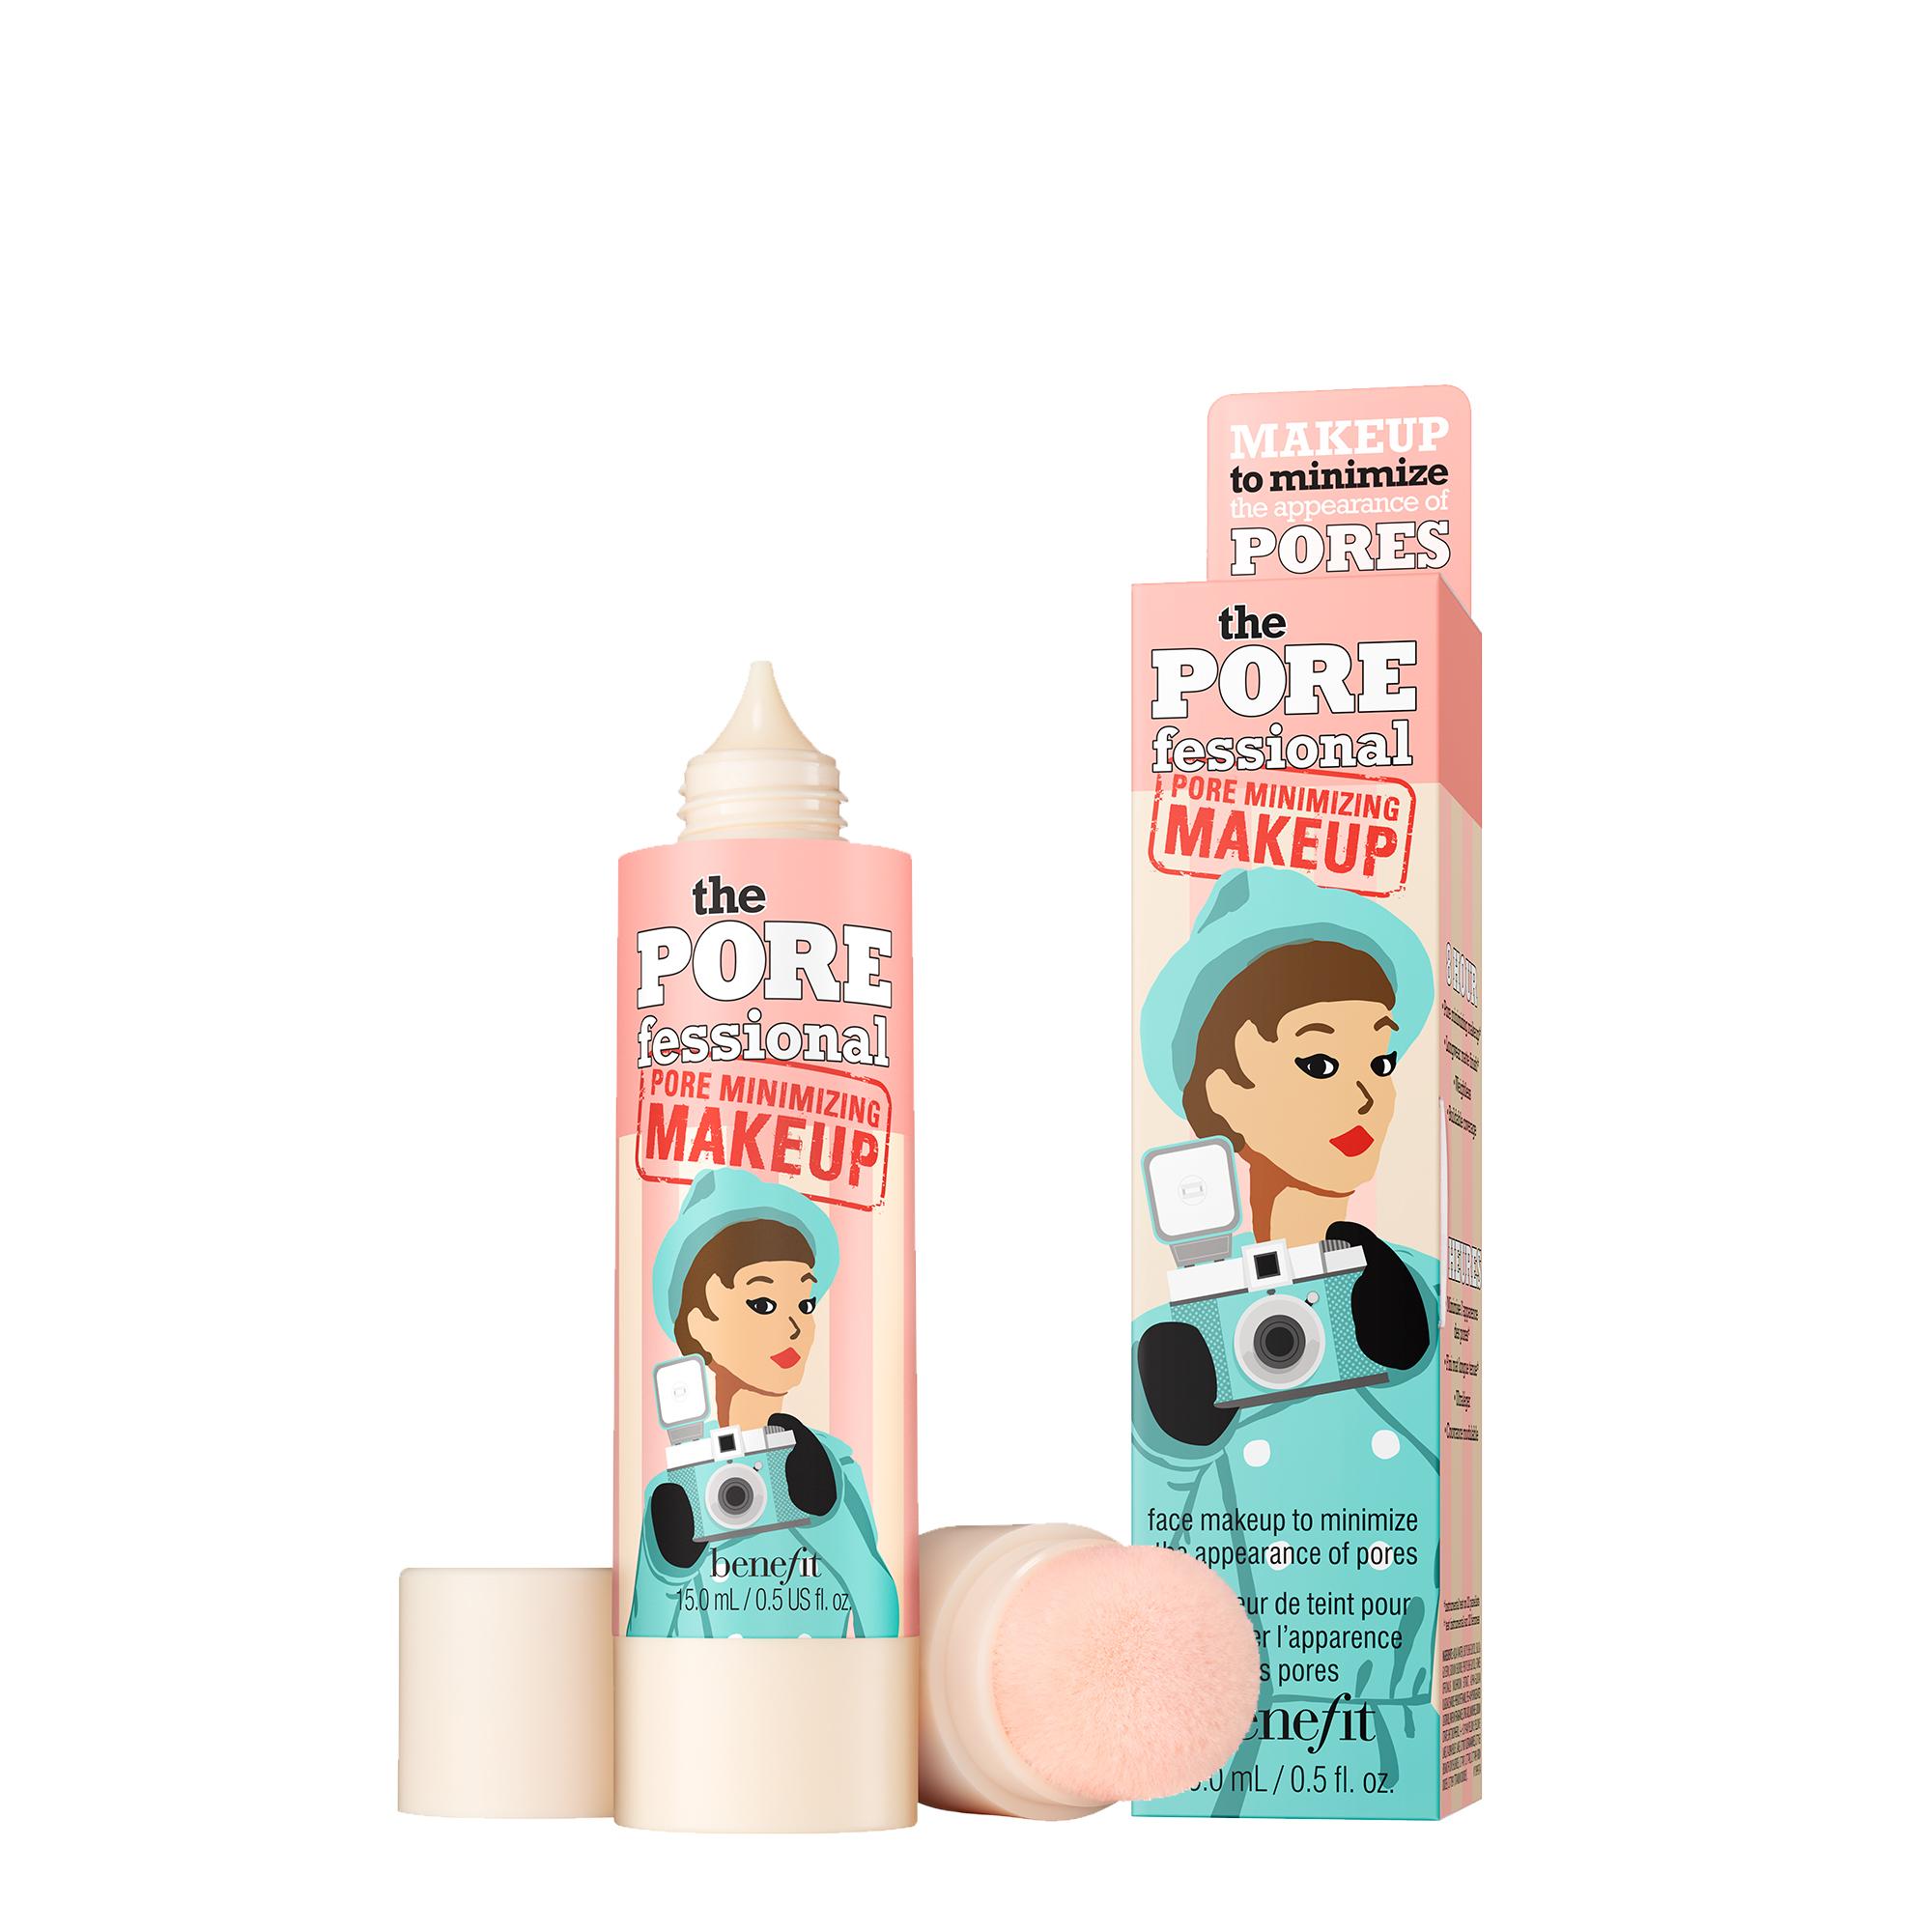 The Porefessional Pore Minimizing